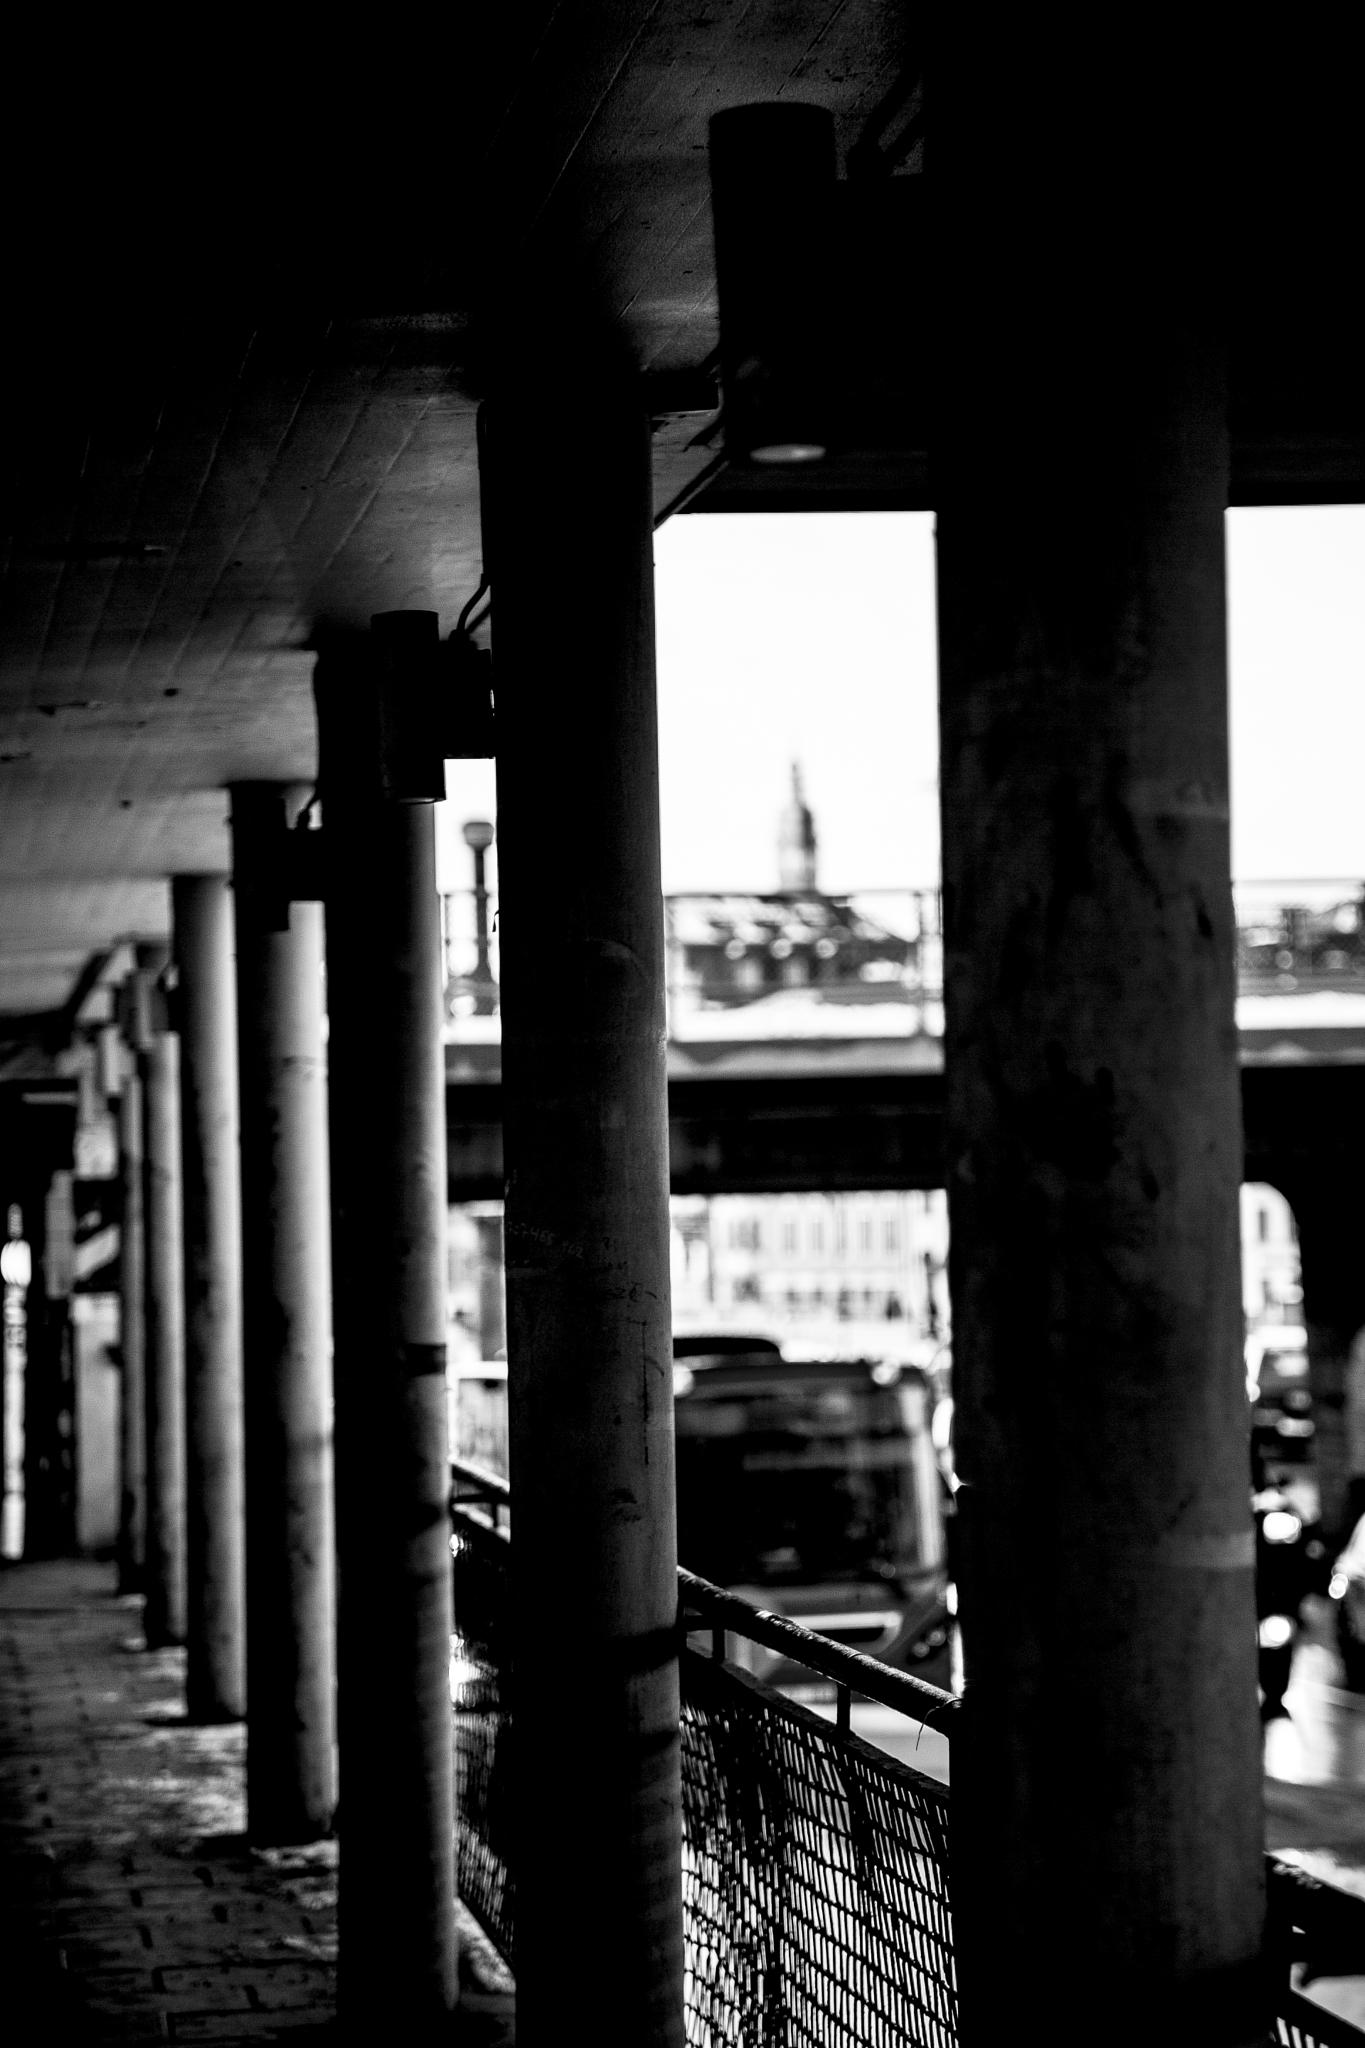 Pillars by gerry.askefalk